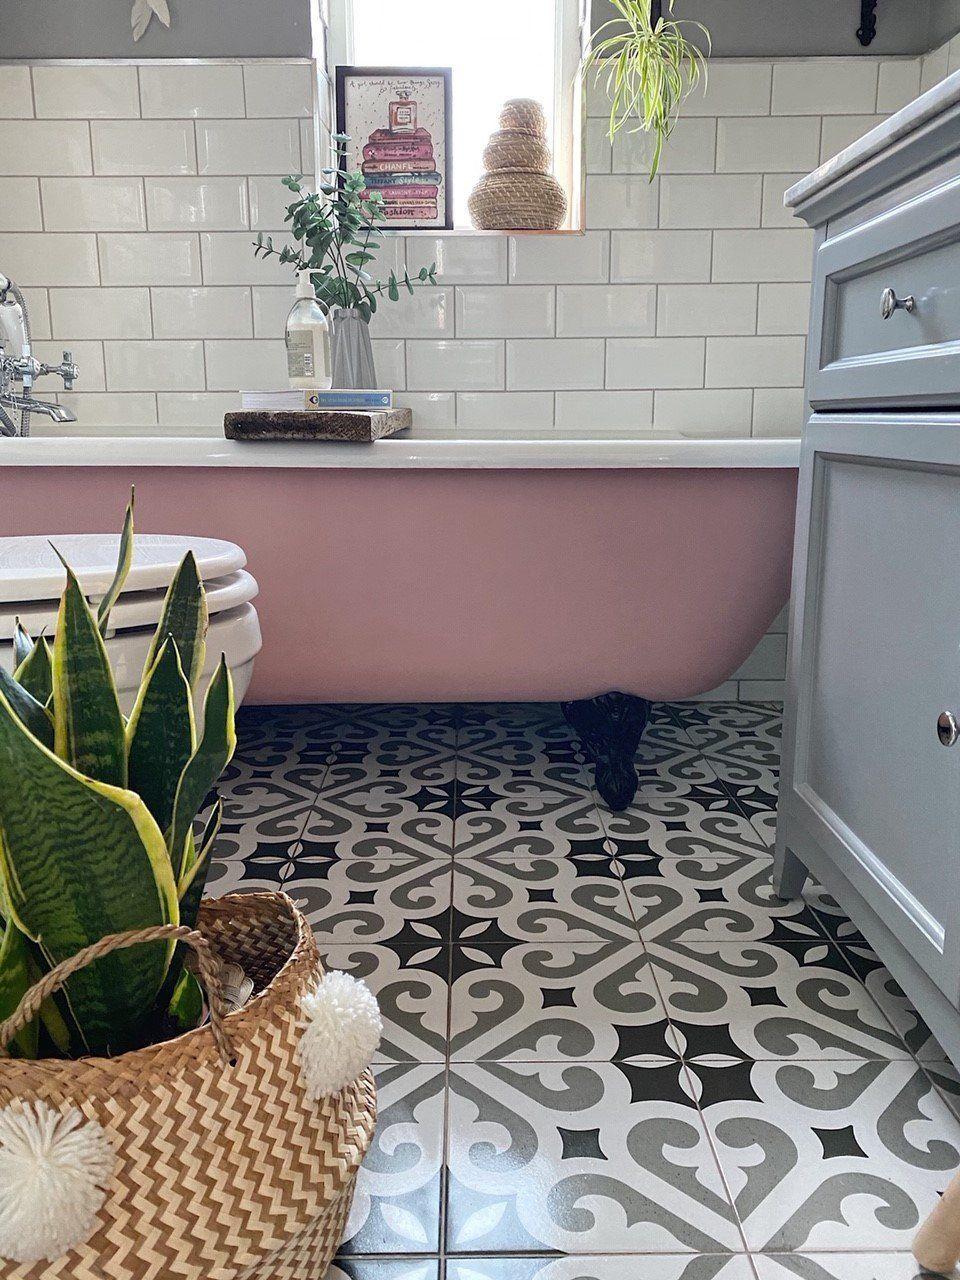 10 Ways to Makeover Your Bathroom on a Budget - Melanie Jade Design